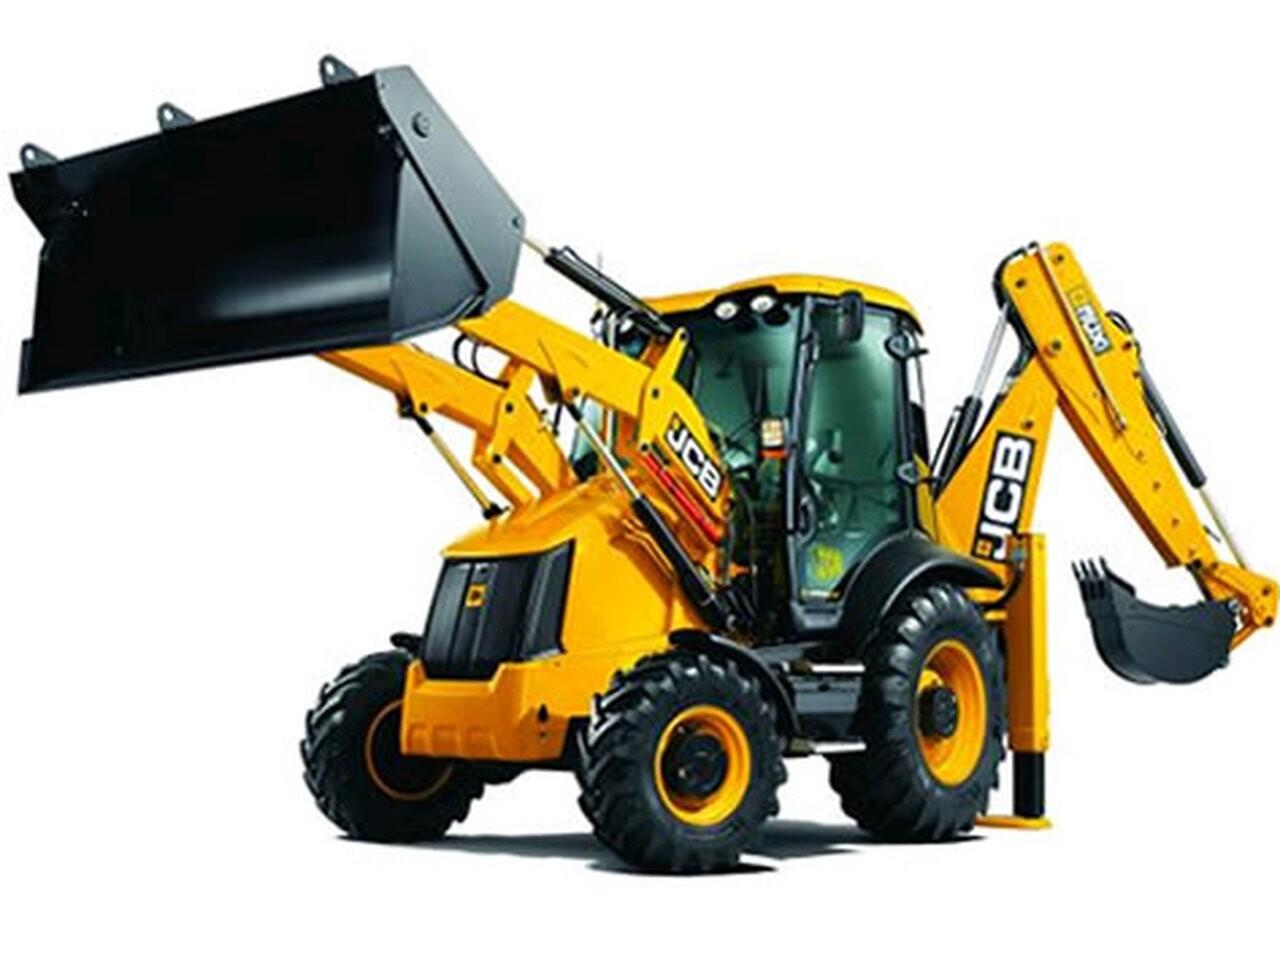 8 Tonne Wheeled Excavator